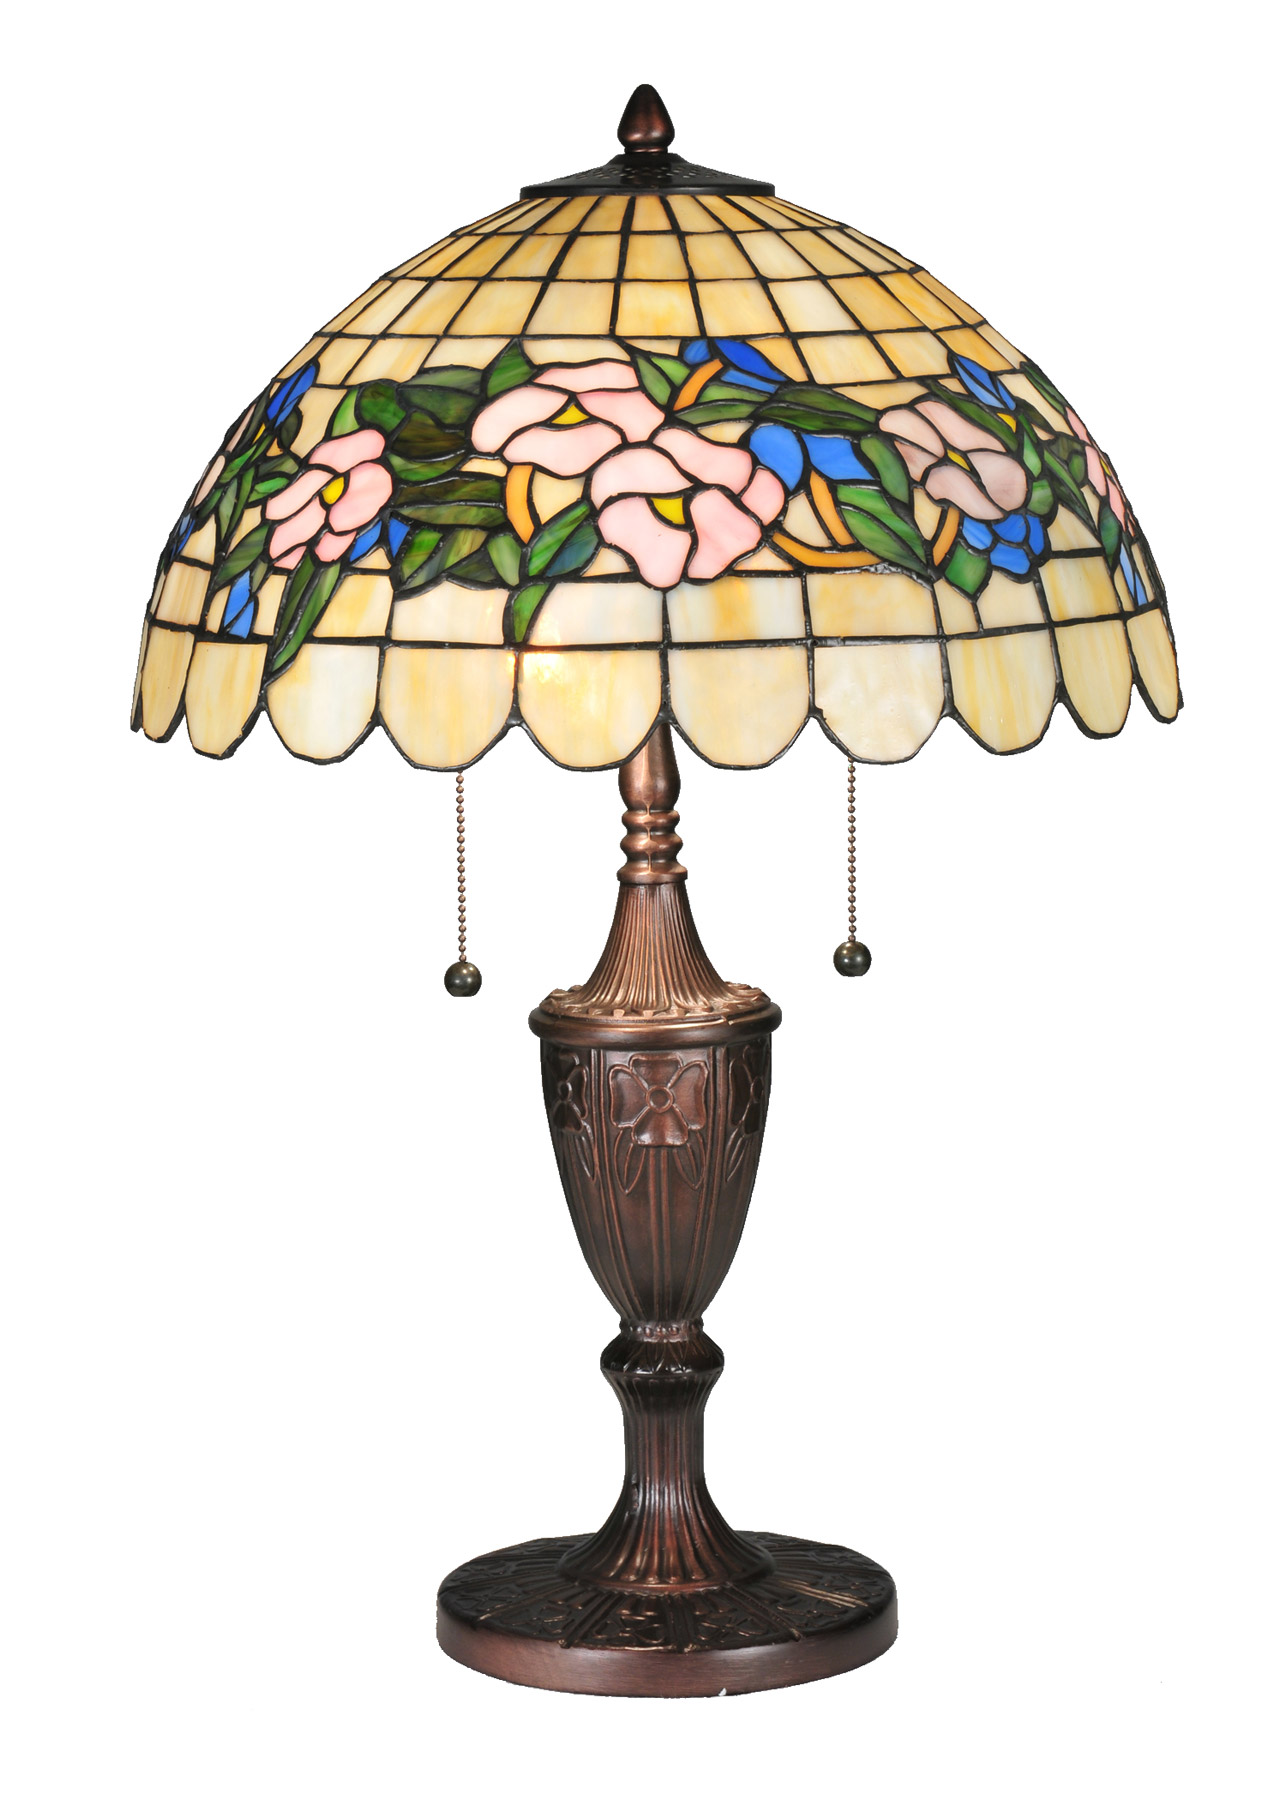 meyda 106541 tiffany pansy table lamp. Black Bedroom Furniture Sets. Home Design Ideas